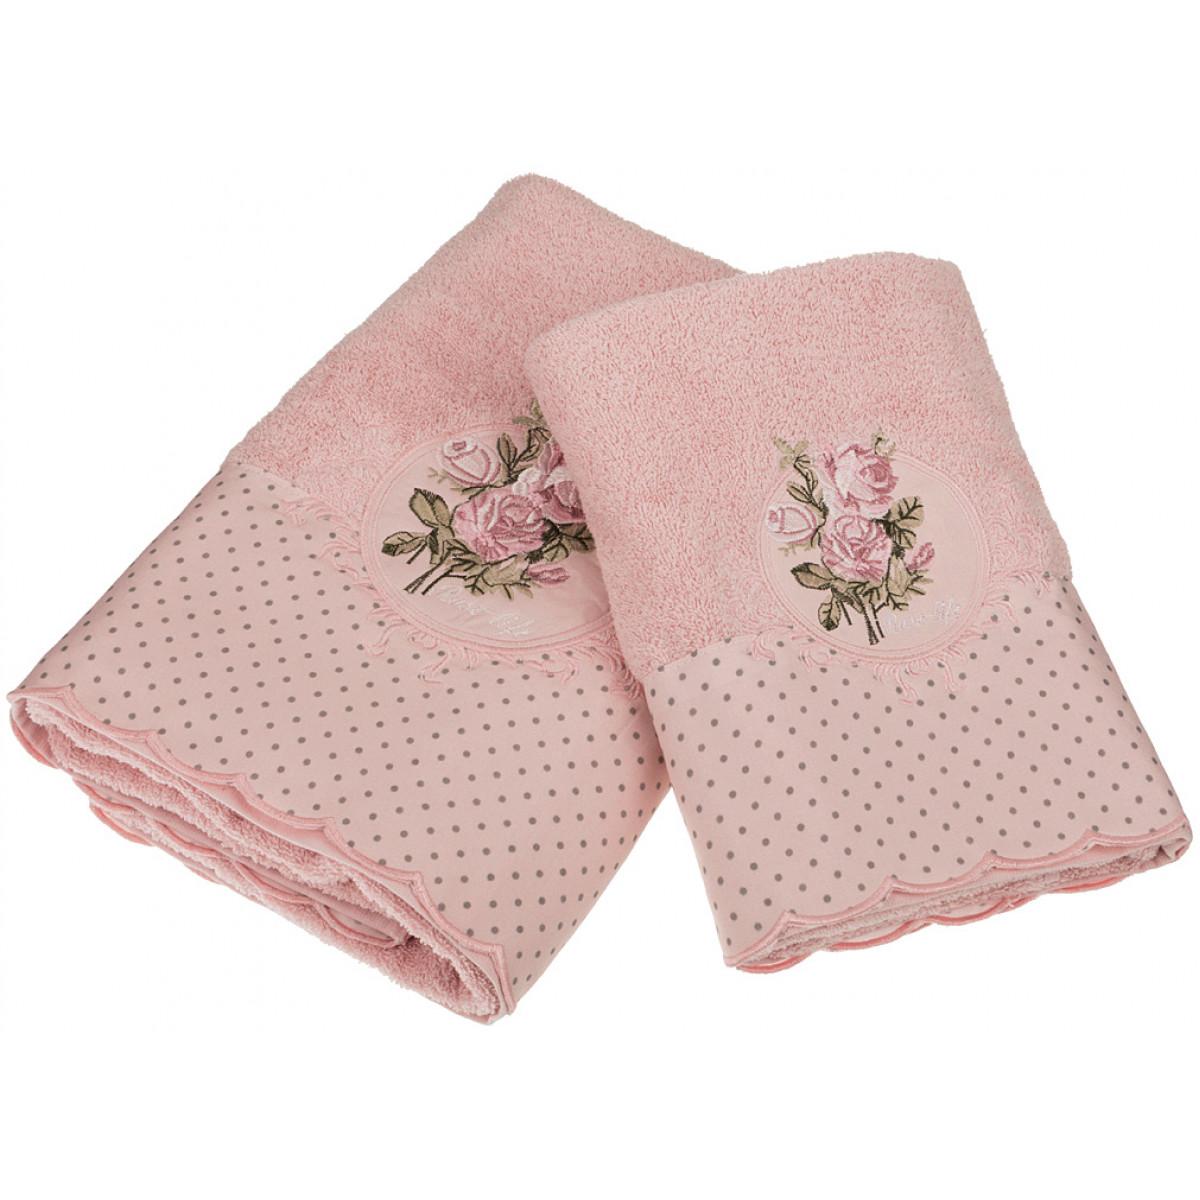 Полотенца Santalino Полотенце Netta  (50х90 см,70х140 см) полотенца santalino полотенце shulamite 40х70 см